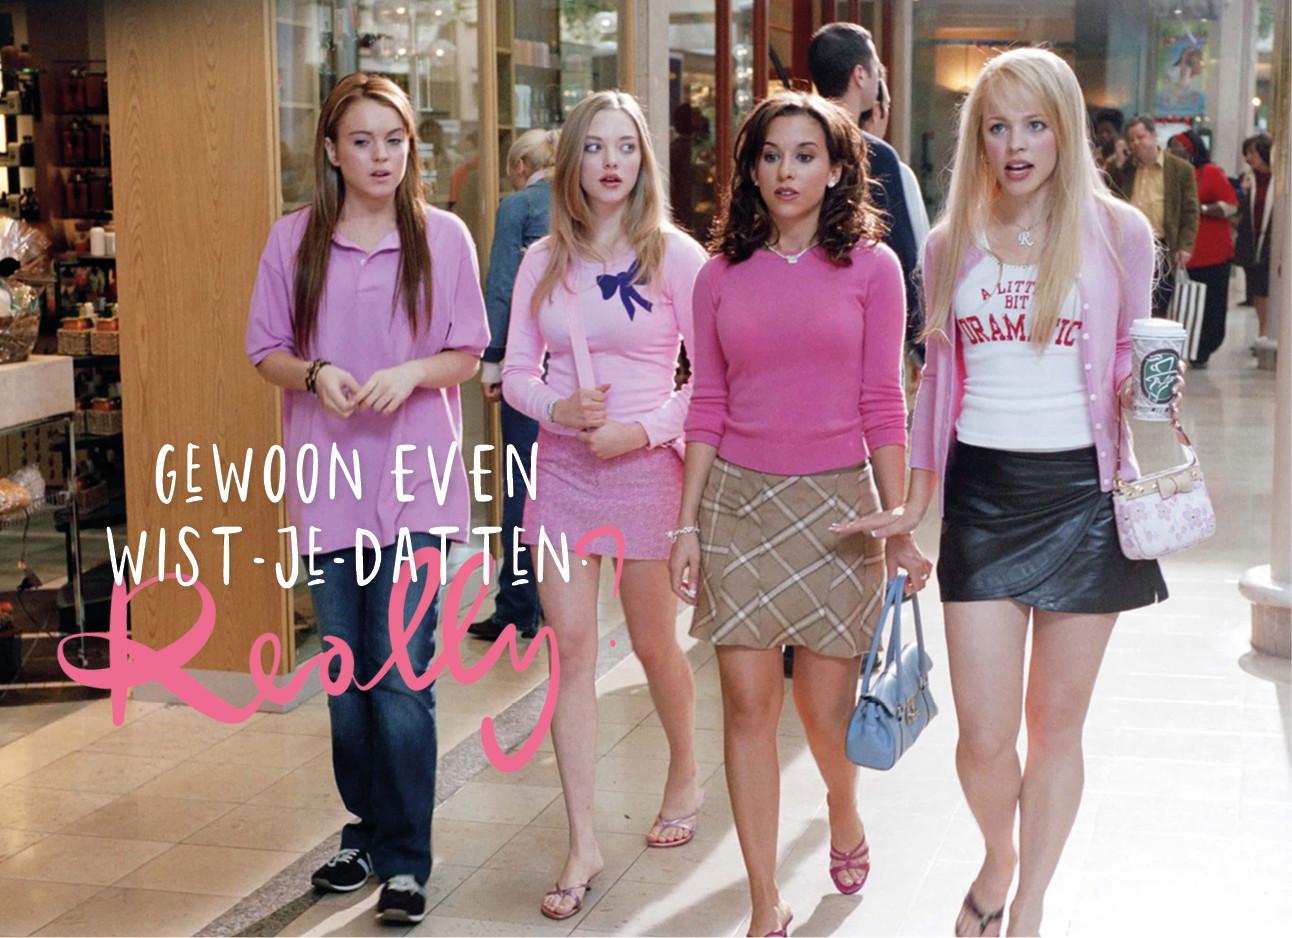 10 onnodig achterlijke weetjes over Mean Girls